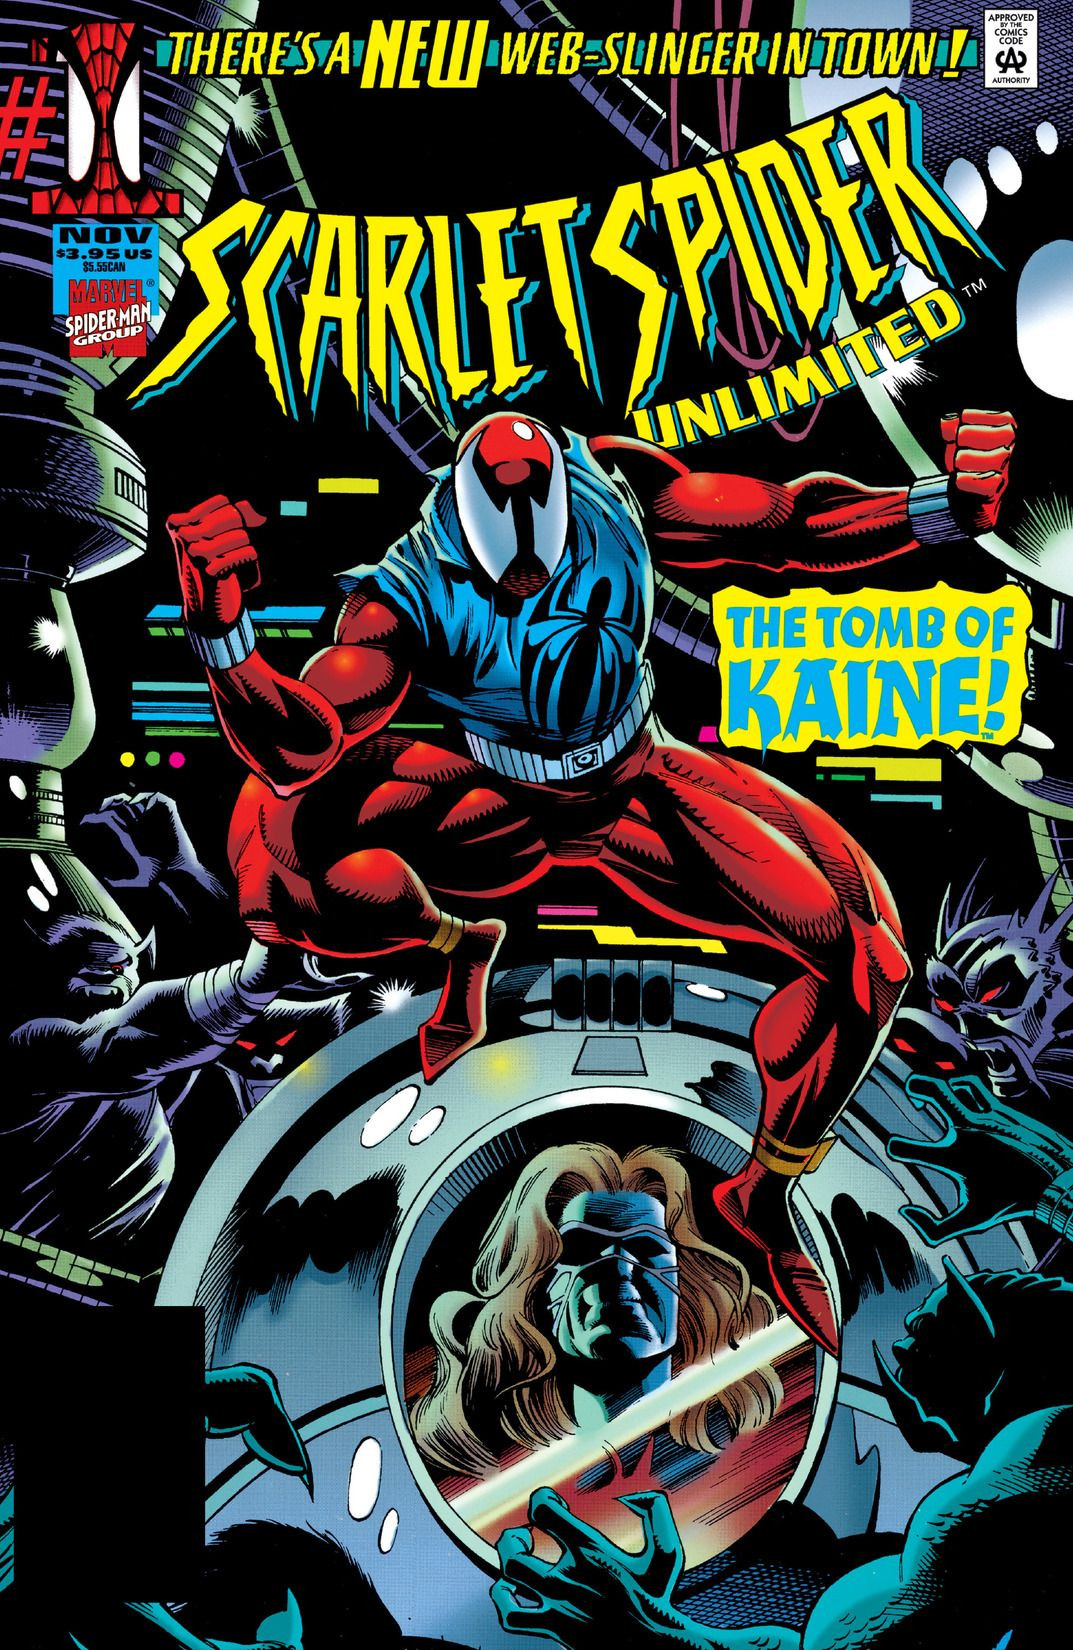 Scarlet Spider Unlimited Vol 1 1